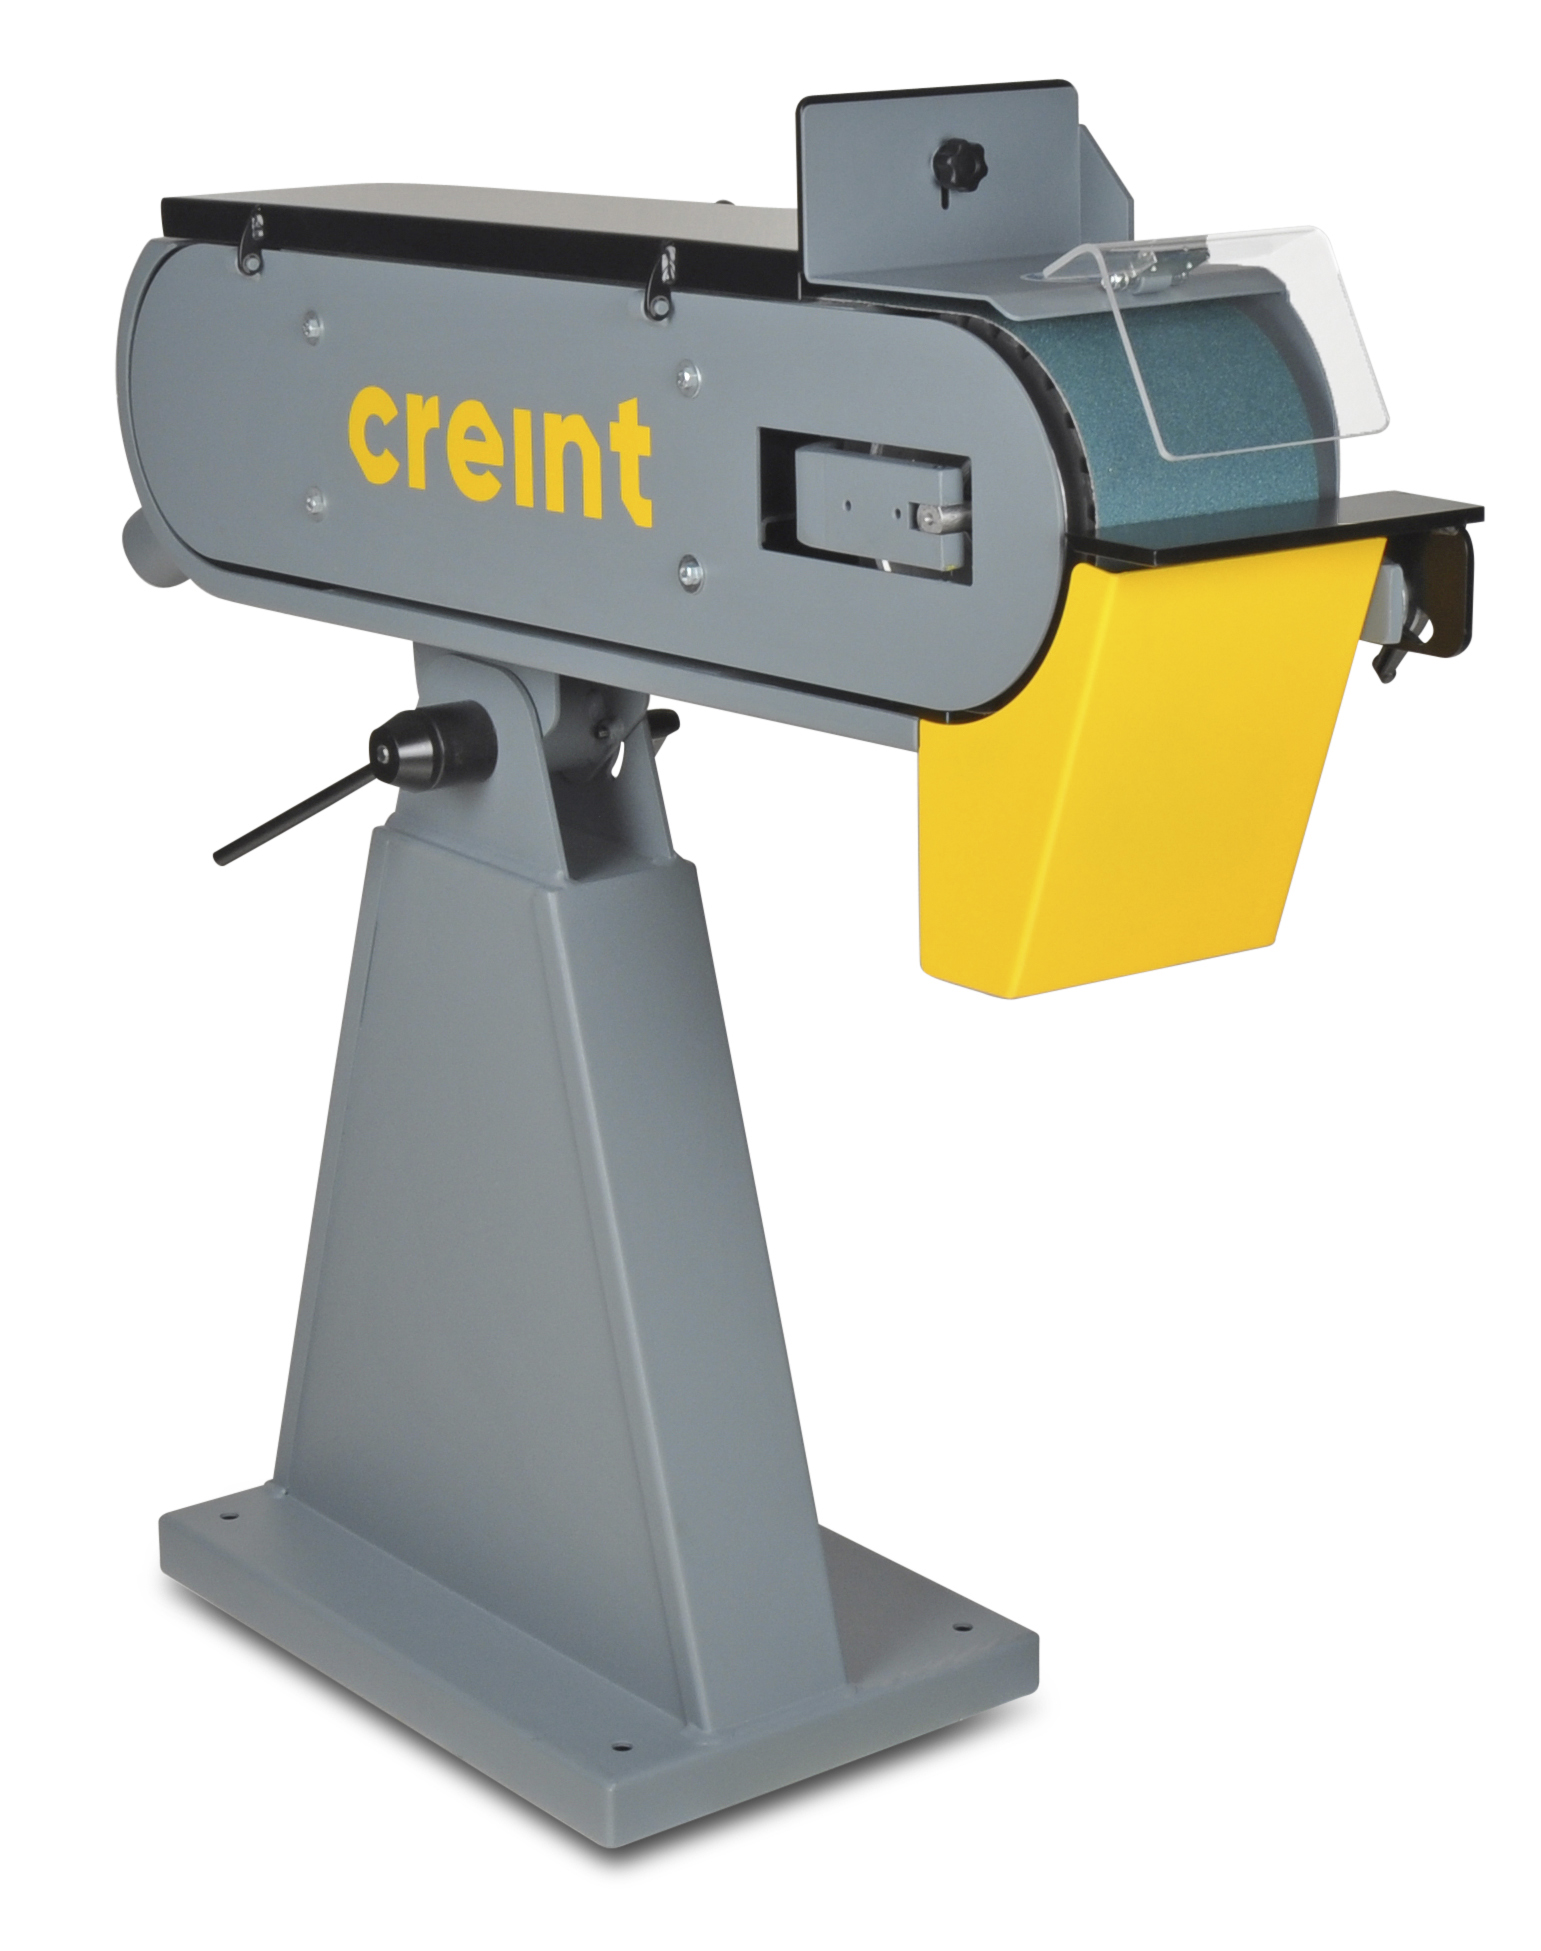 050166-Creint-BIHD150-3-links